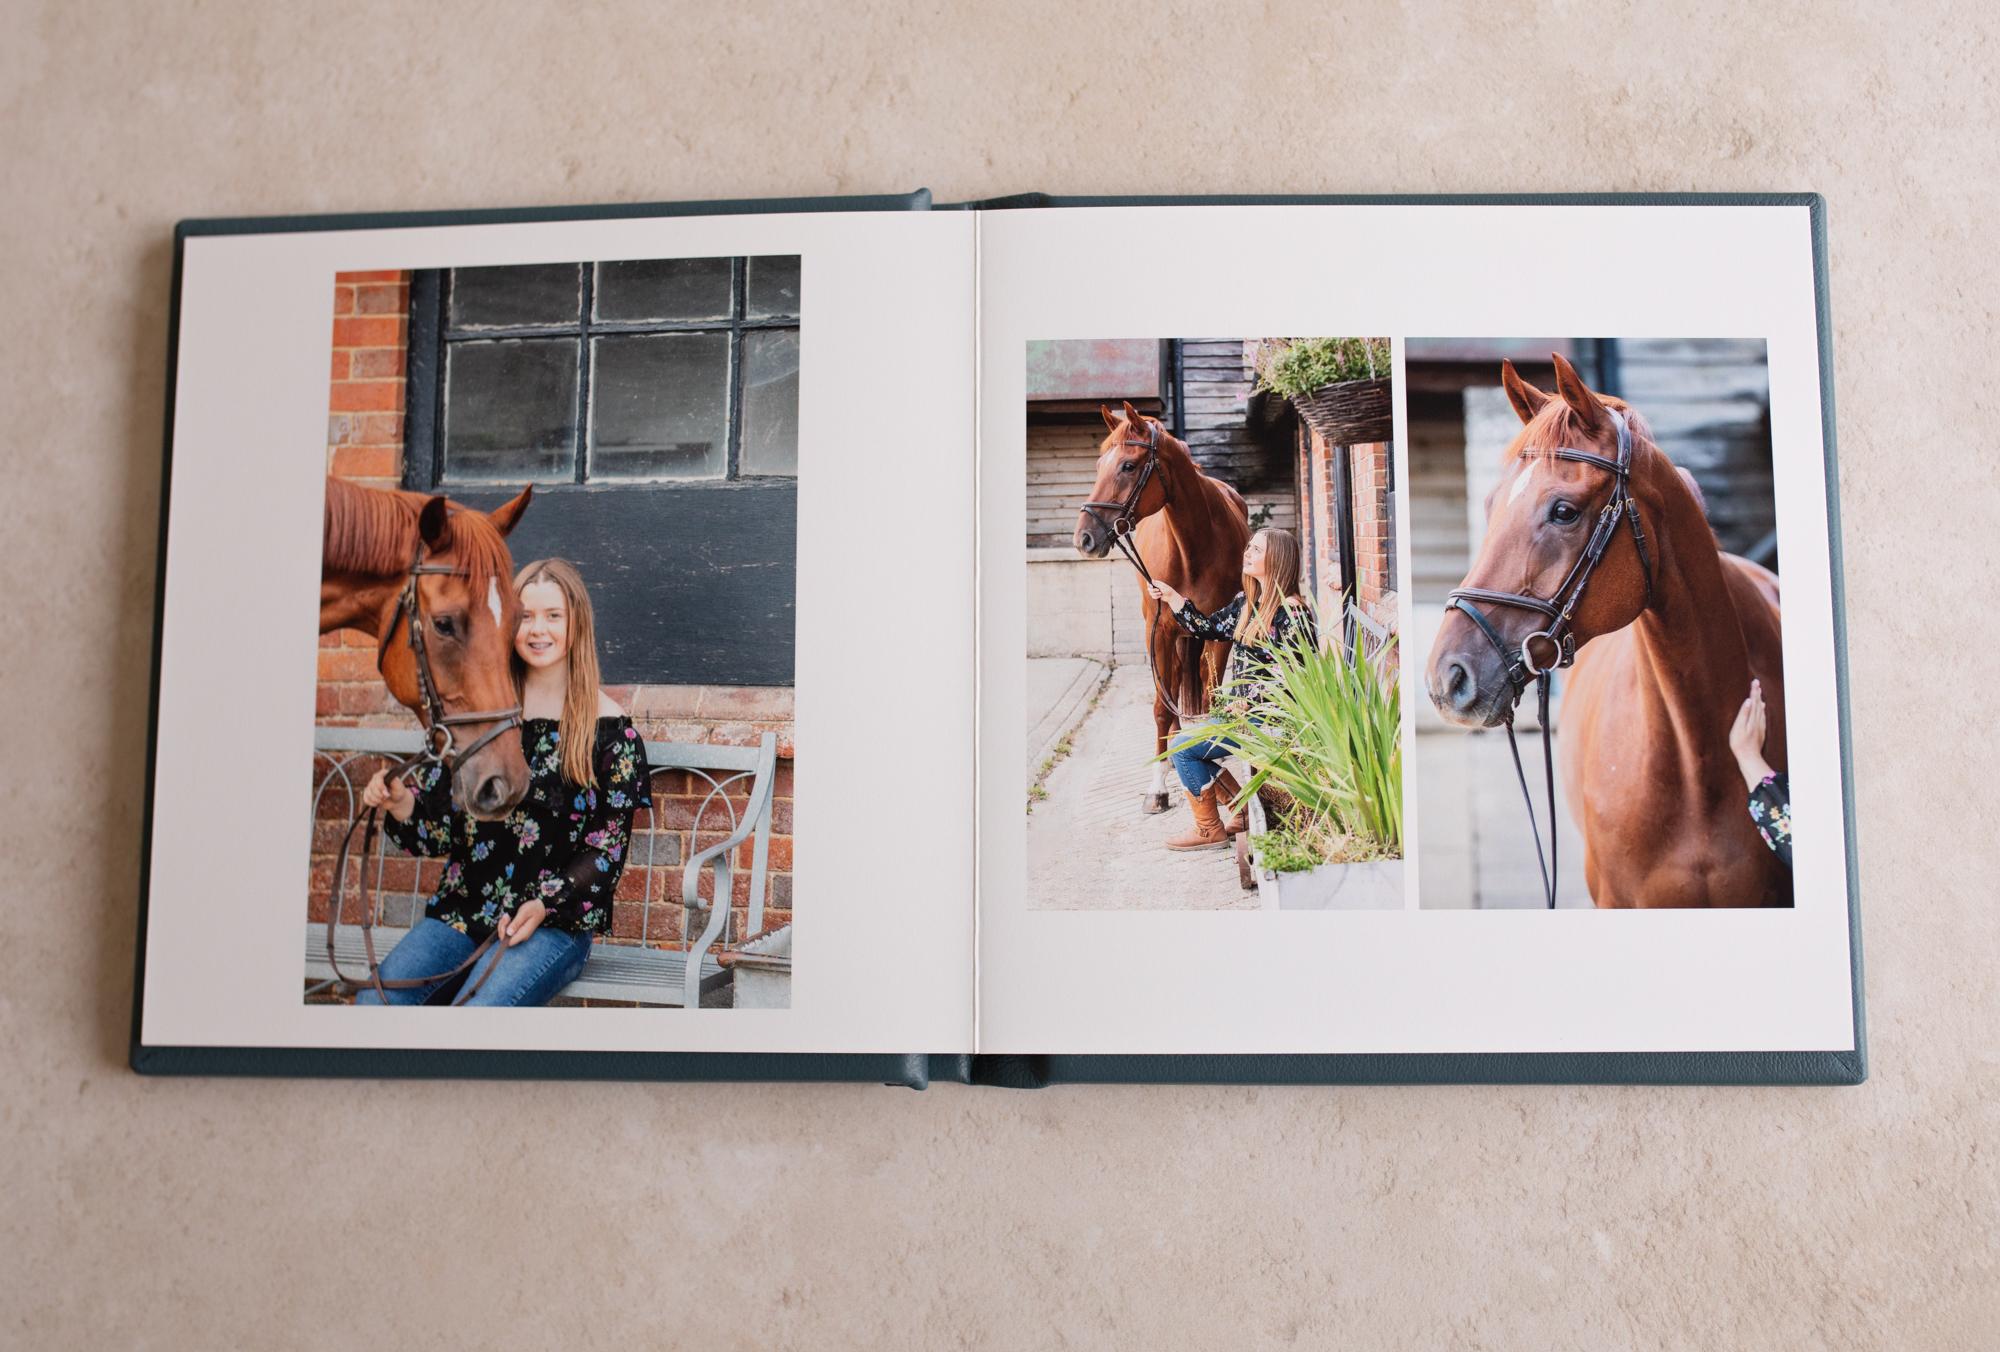 Album from Jo Worthington Photographer